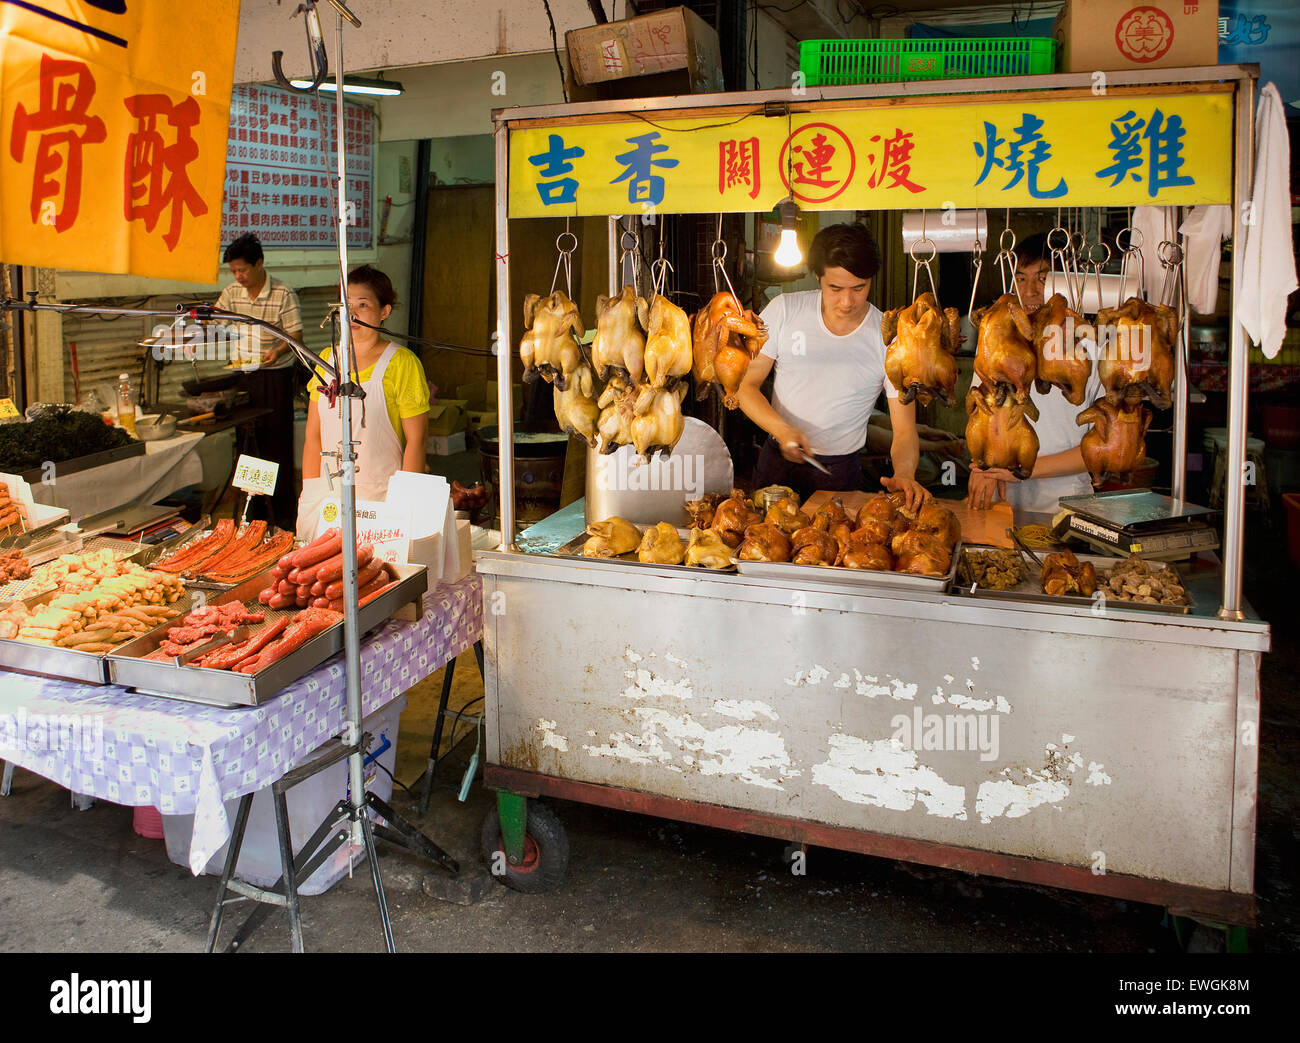 Los vendedores ambulantes de comida en Taipei Taiwán Asia Imagen De Stock